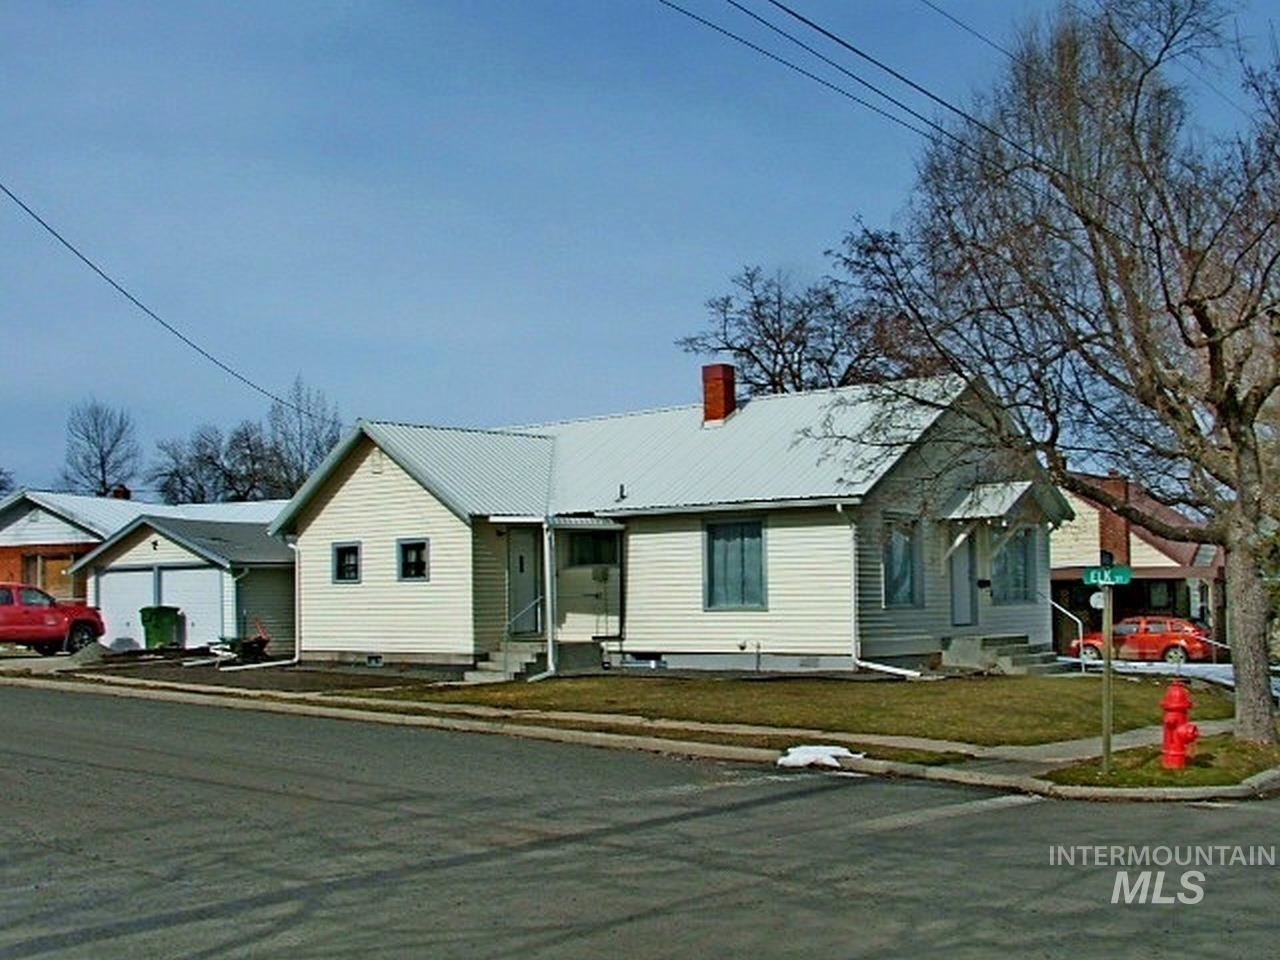 518 S Idaho Avenue, Grangeville, ID 83530 - MLS#: 98813716